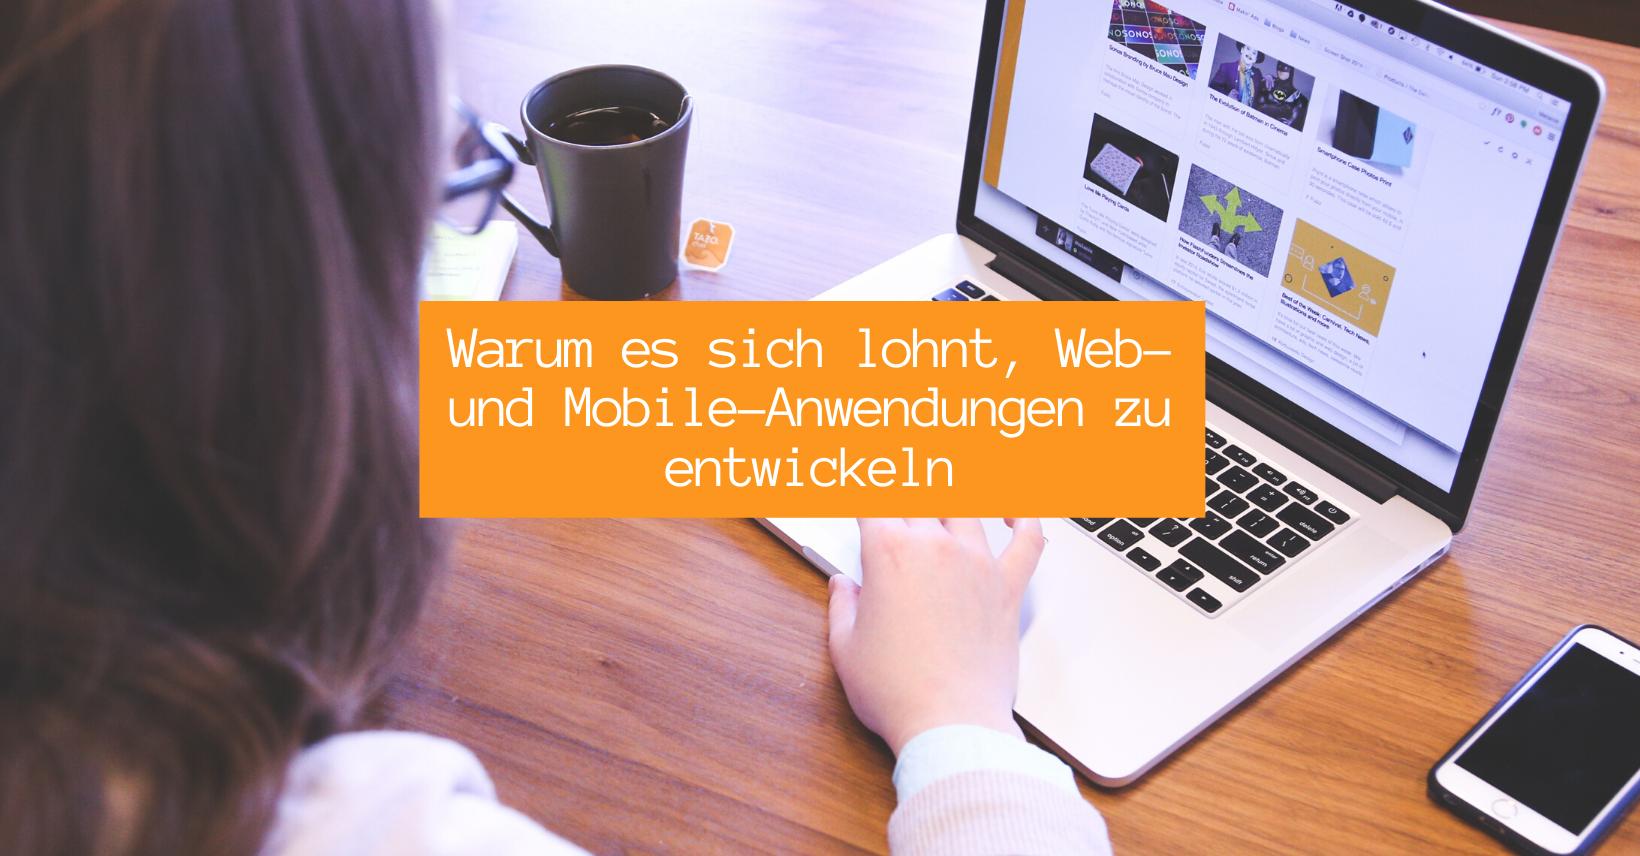 Mobile-Anwendungen